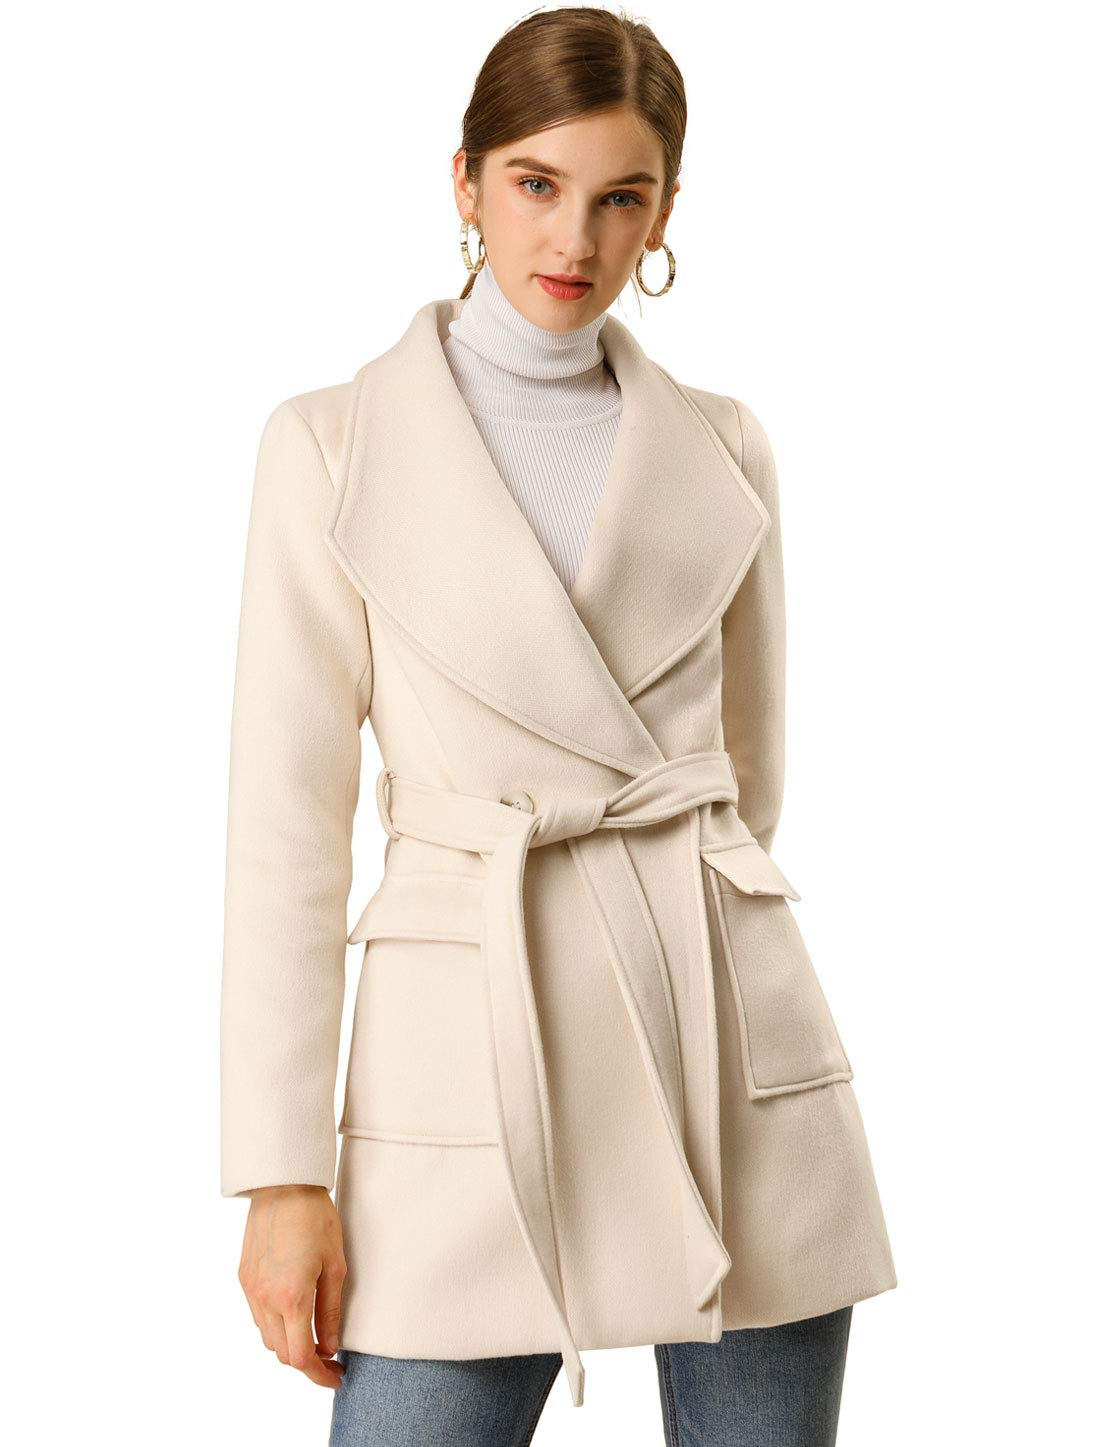 Allegra K Women's Shawl Collar Lapel Winter Belted Coat with Pockets